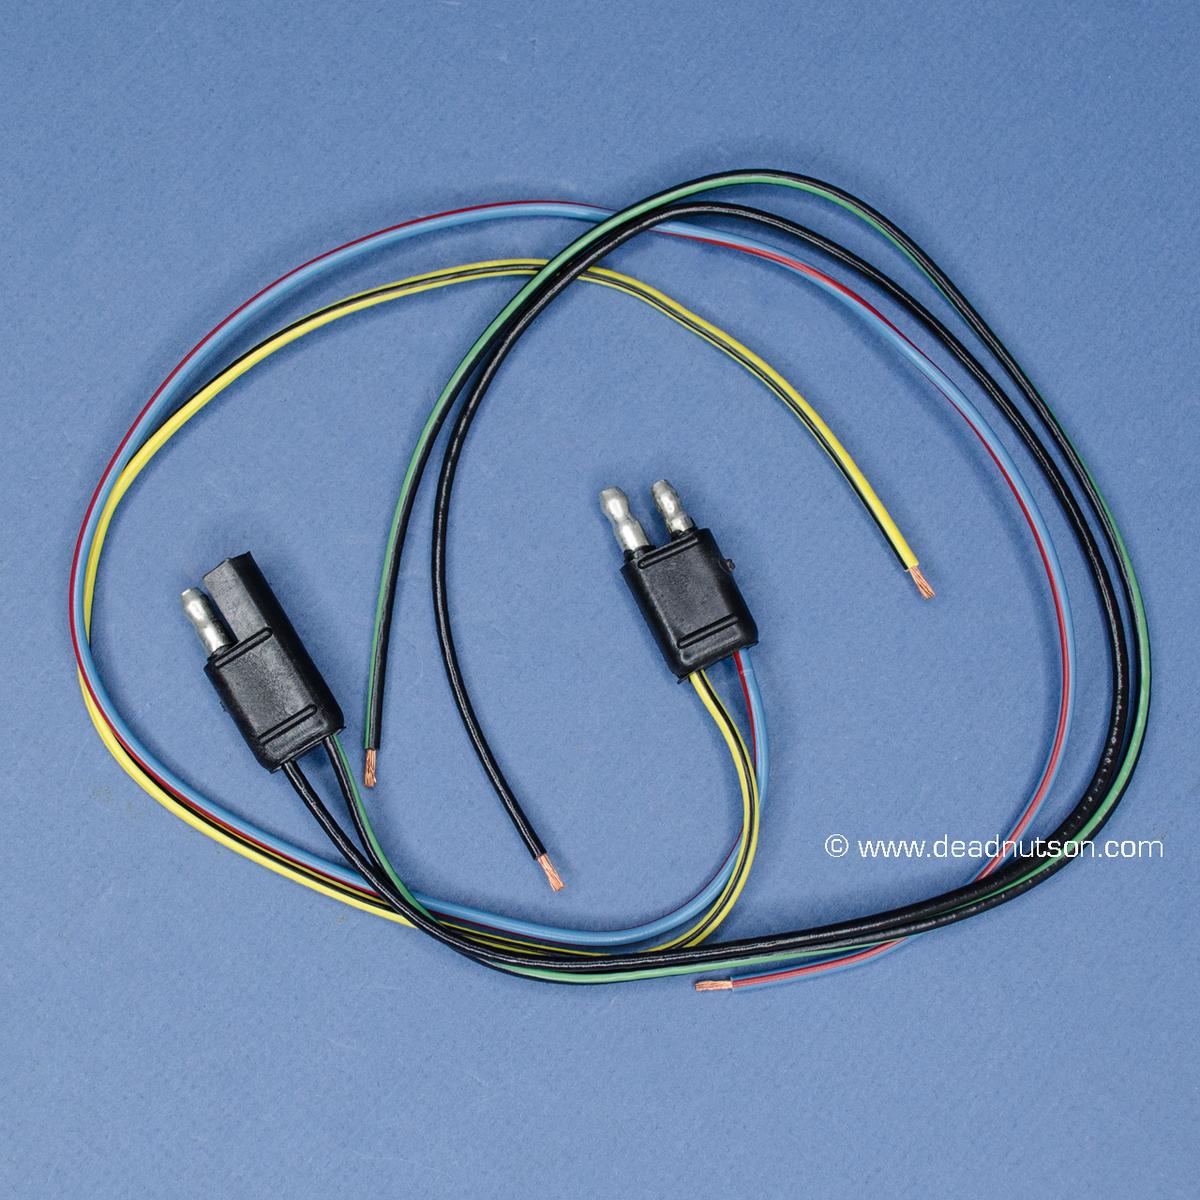 1967 70 mustang am radio wiring repair harness set dead nuts on rh  deadnutson com 1967 Ford Mustang Alternator Wiring Diagram 1967 Mustang  Wiring Diagram